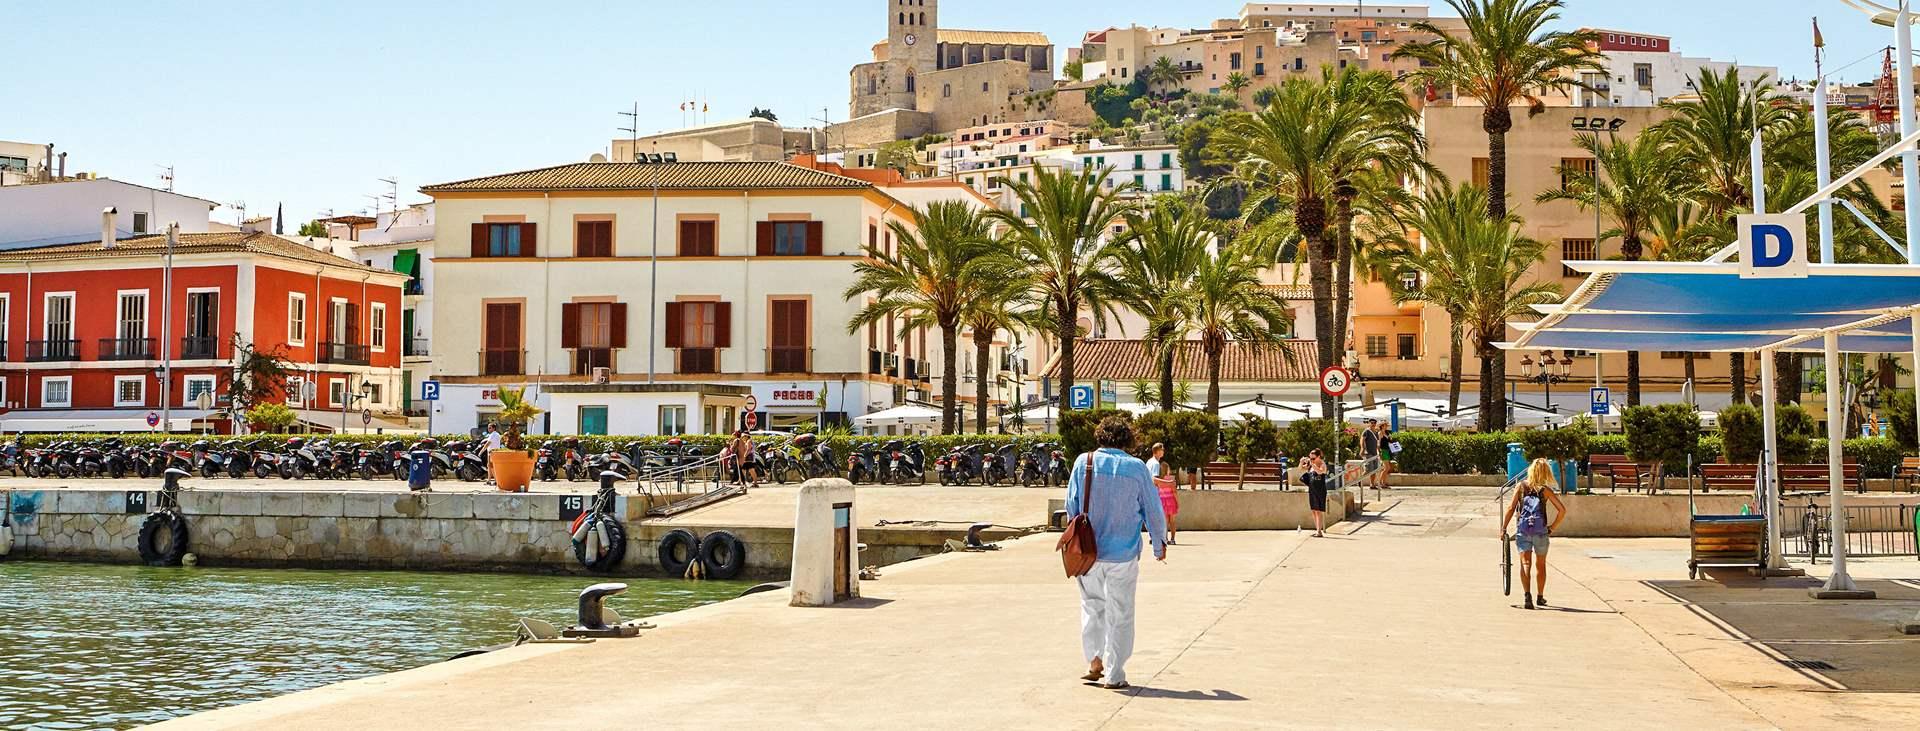 Bestill en reise med Ving til Ibiza by på Ibiza